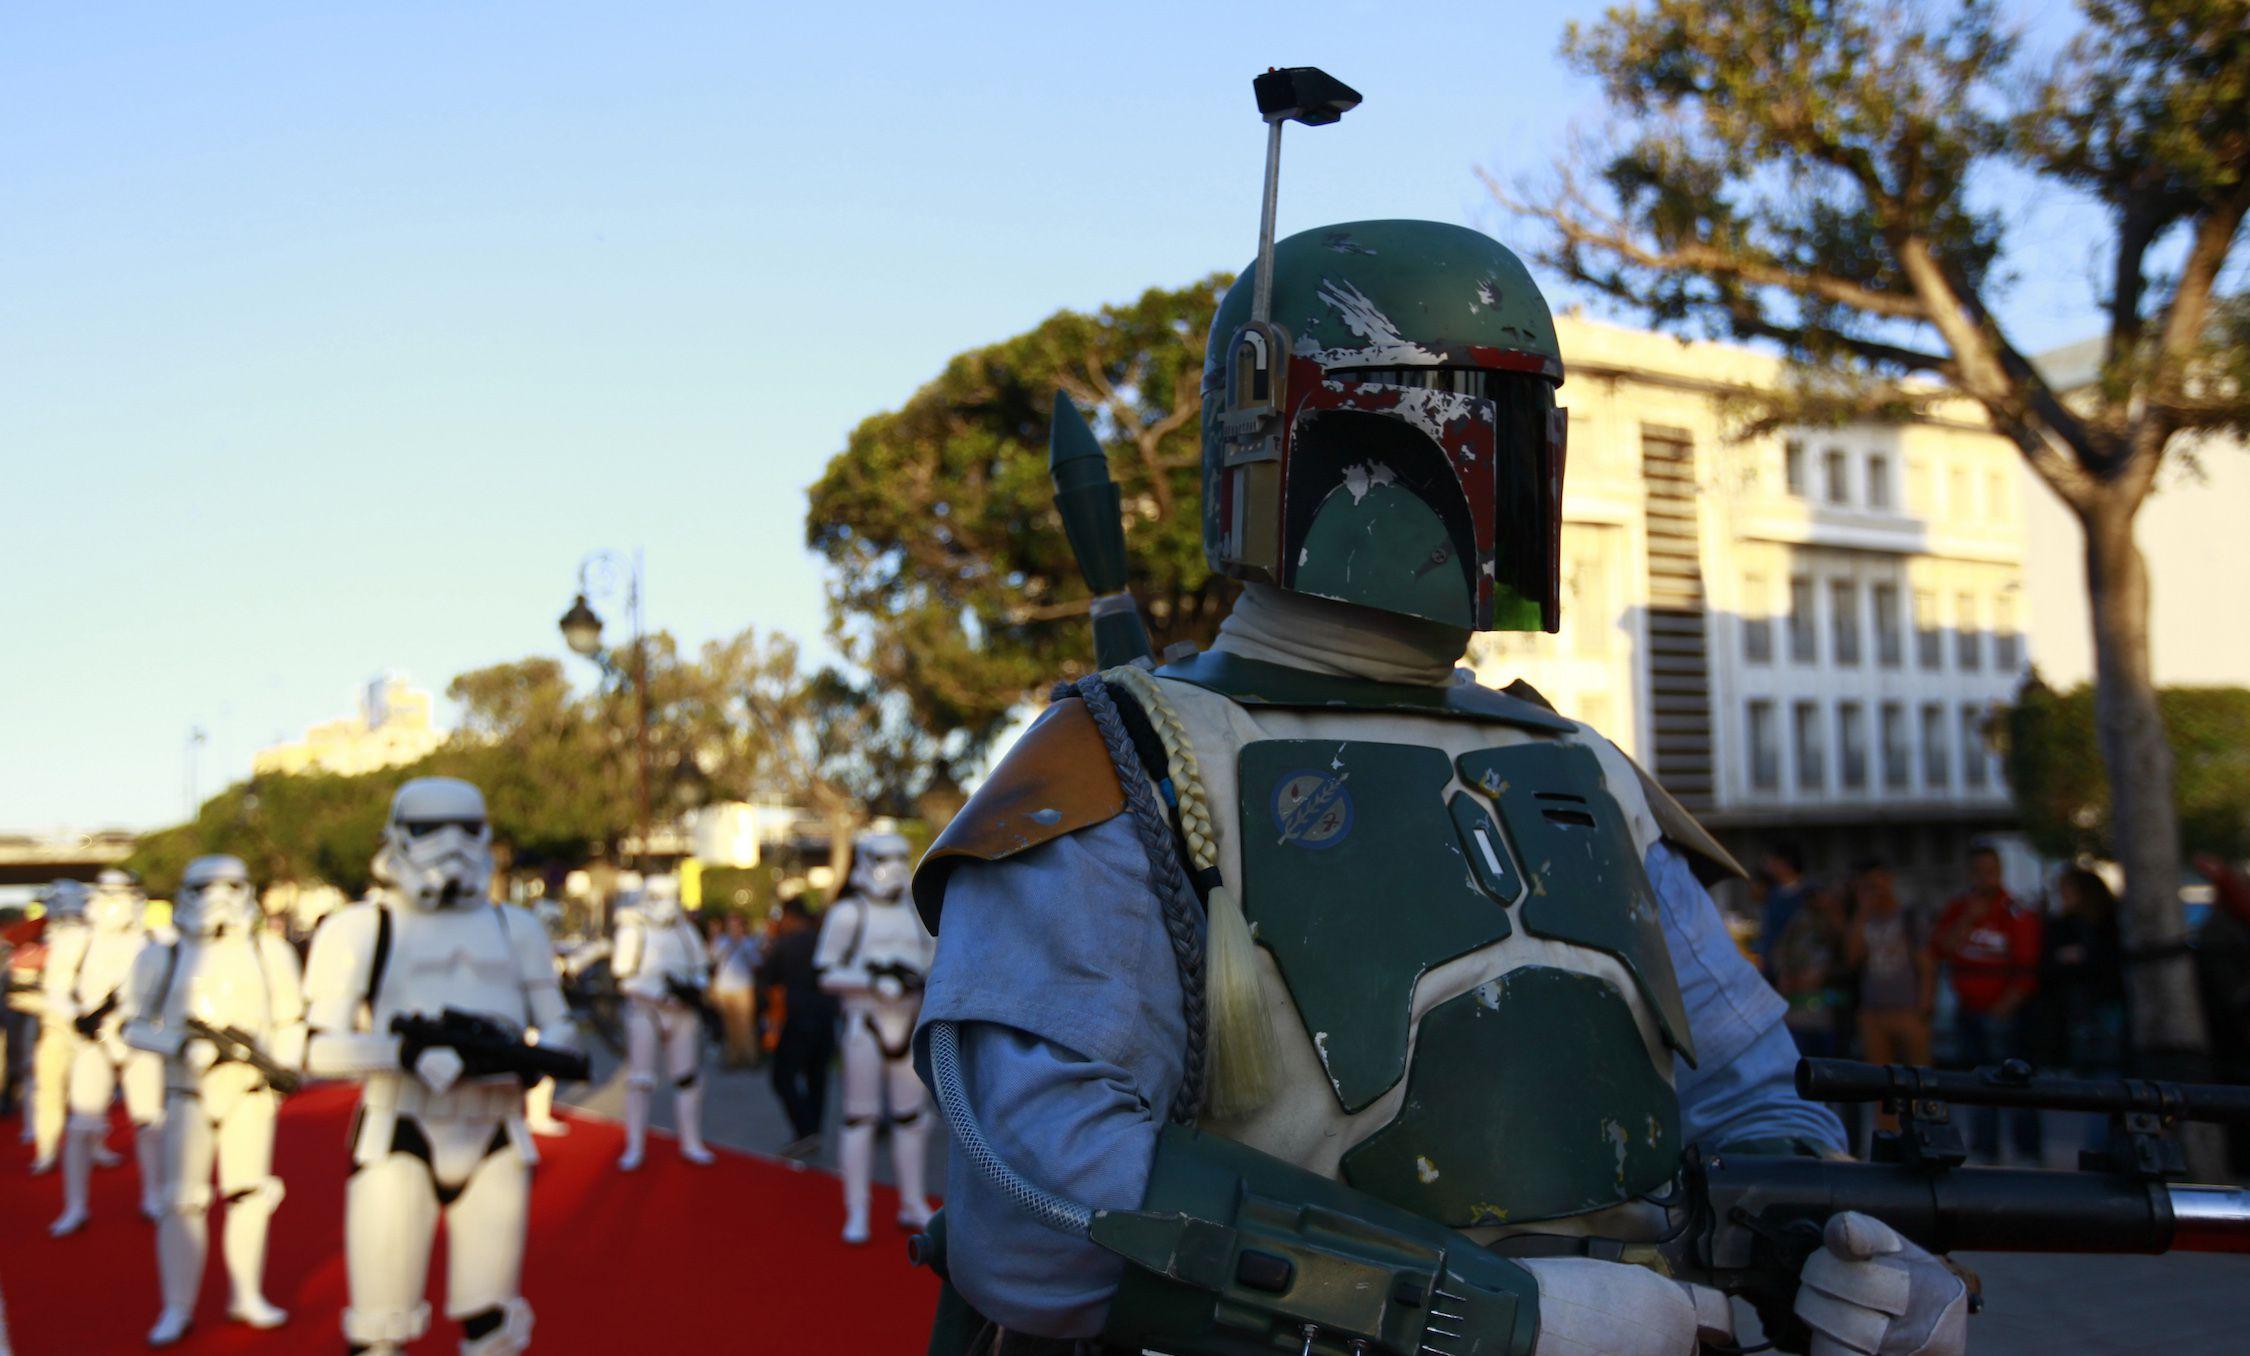 Disney is reshaping 'Star Wars' in the model of Marvel — Quartz